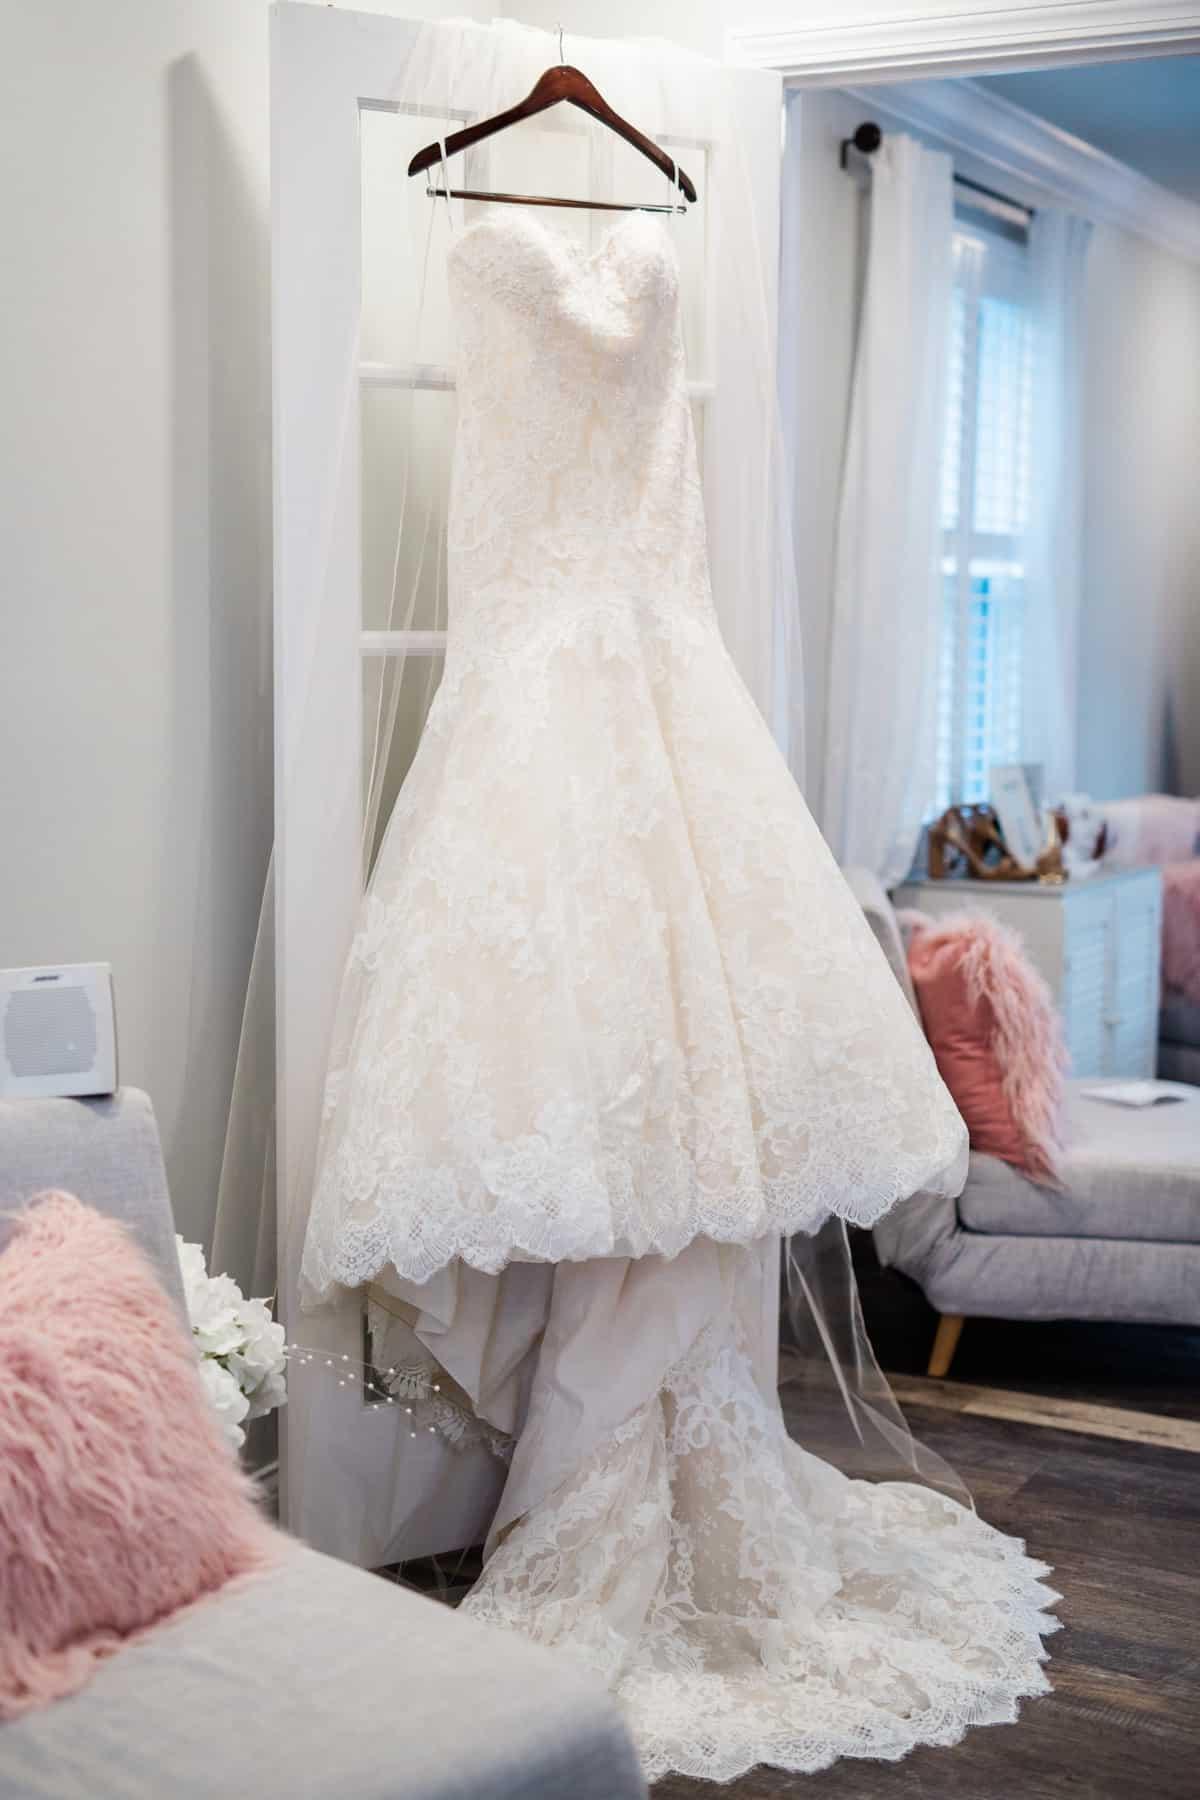 St. Louis Wedding Photographer, Piazza Messina Wedding, St. Louis Wedding Venue, Wedding Dress